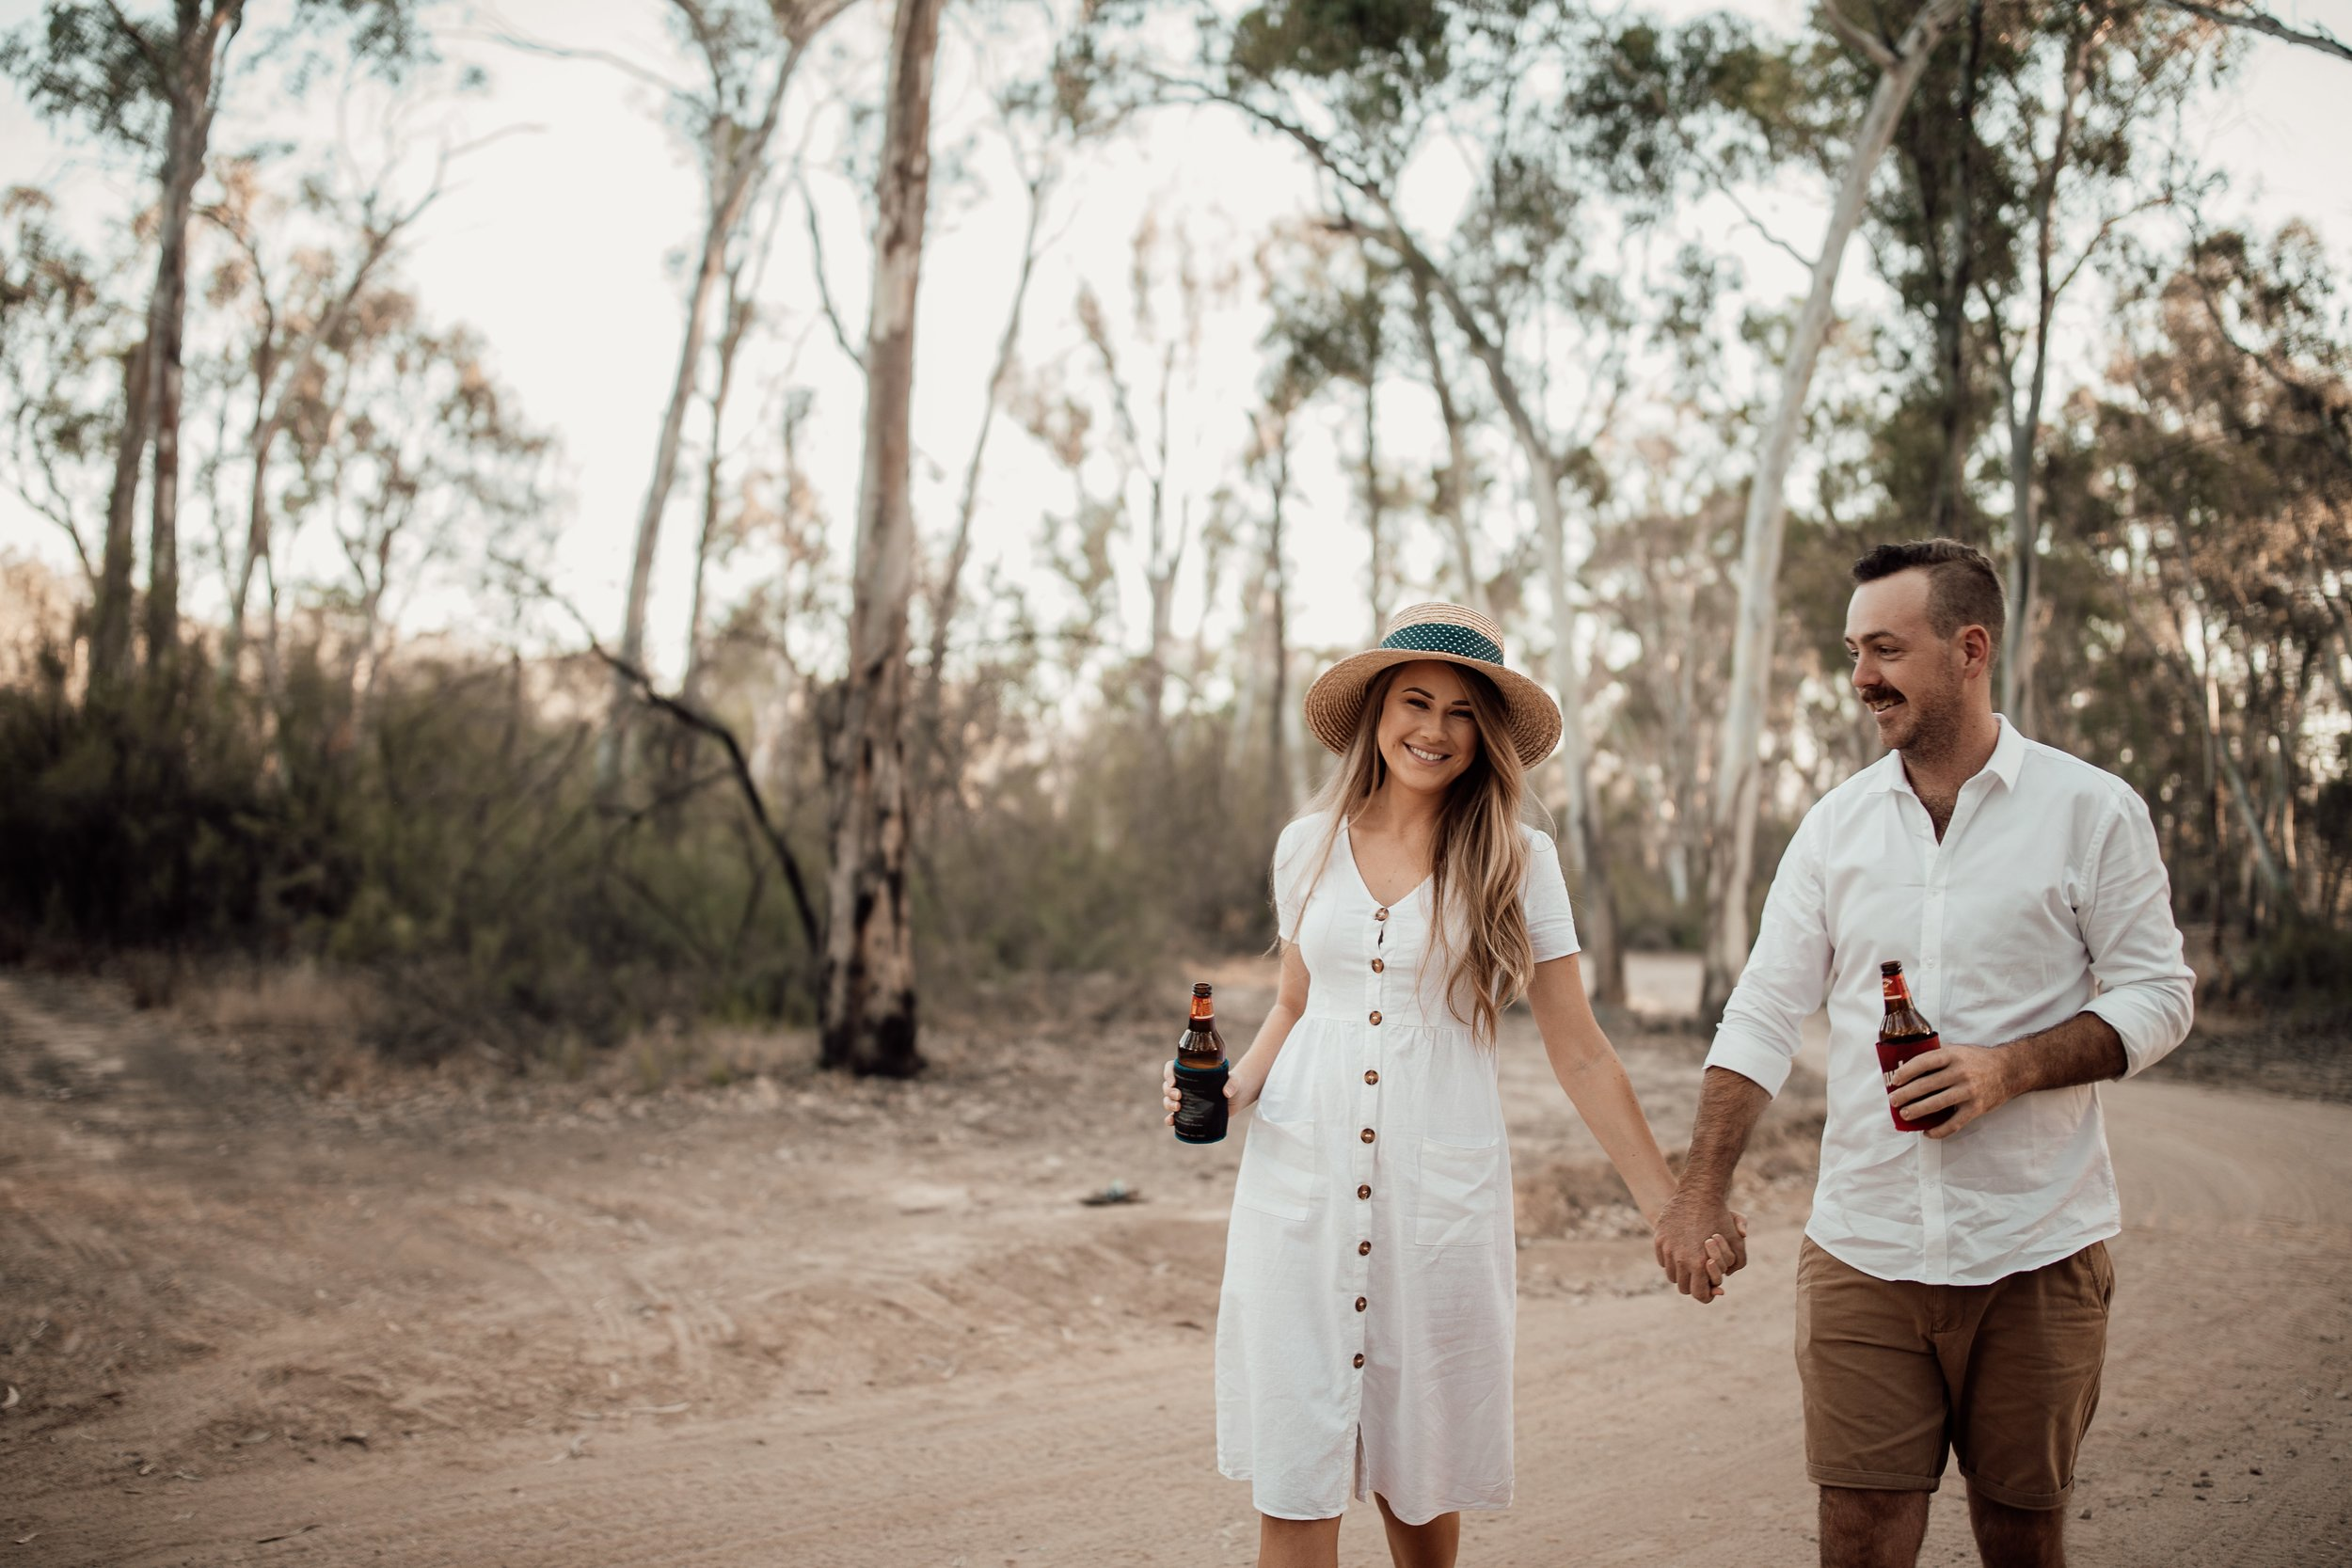 mickalathomas_puremacphotography_weddingphotographer_couplephotographer_Sheppartonphotographer_2811.jpg